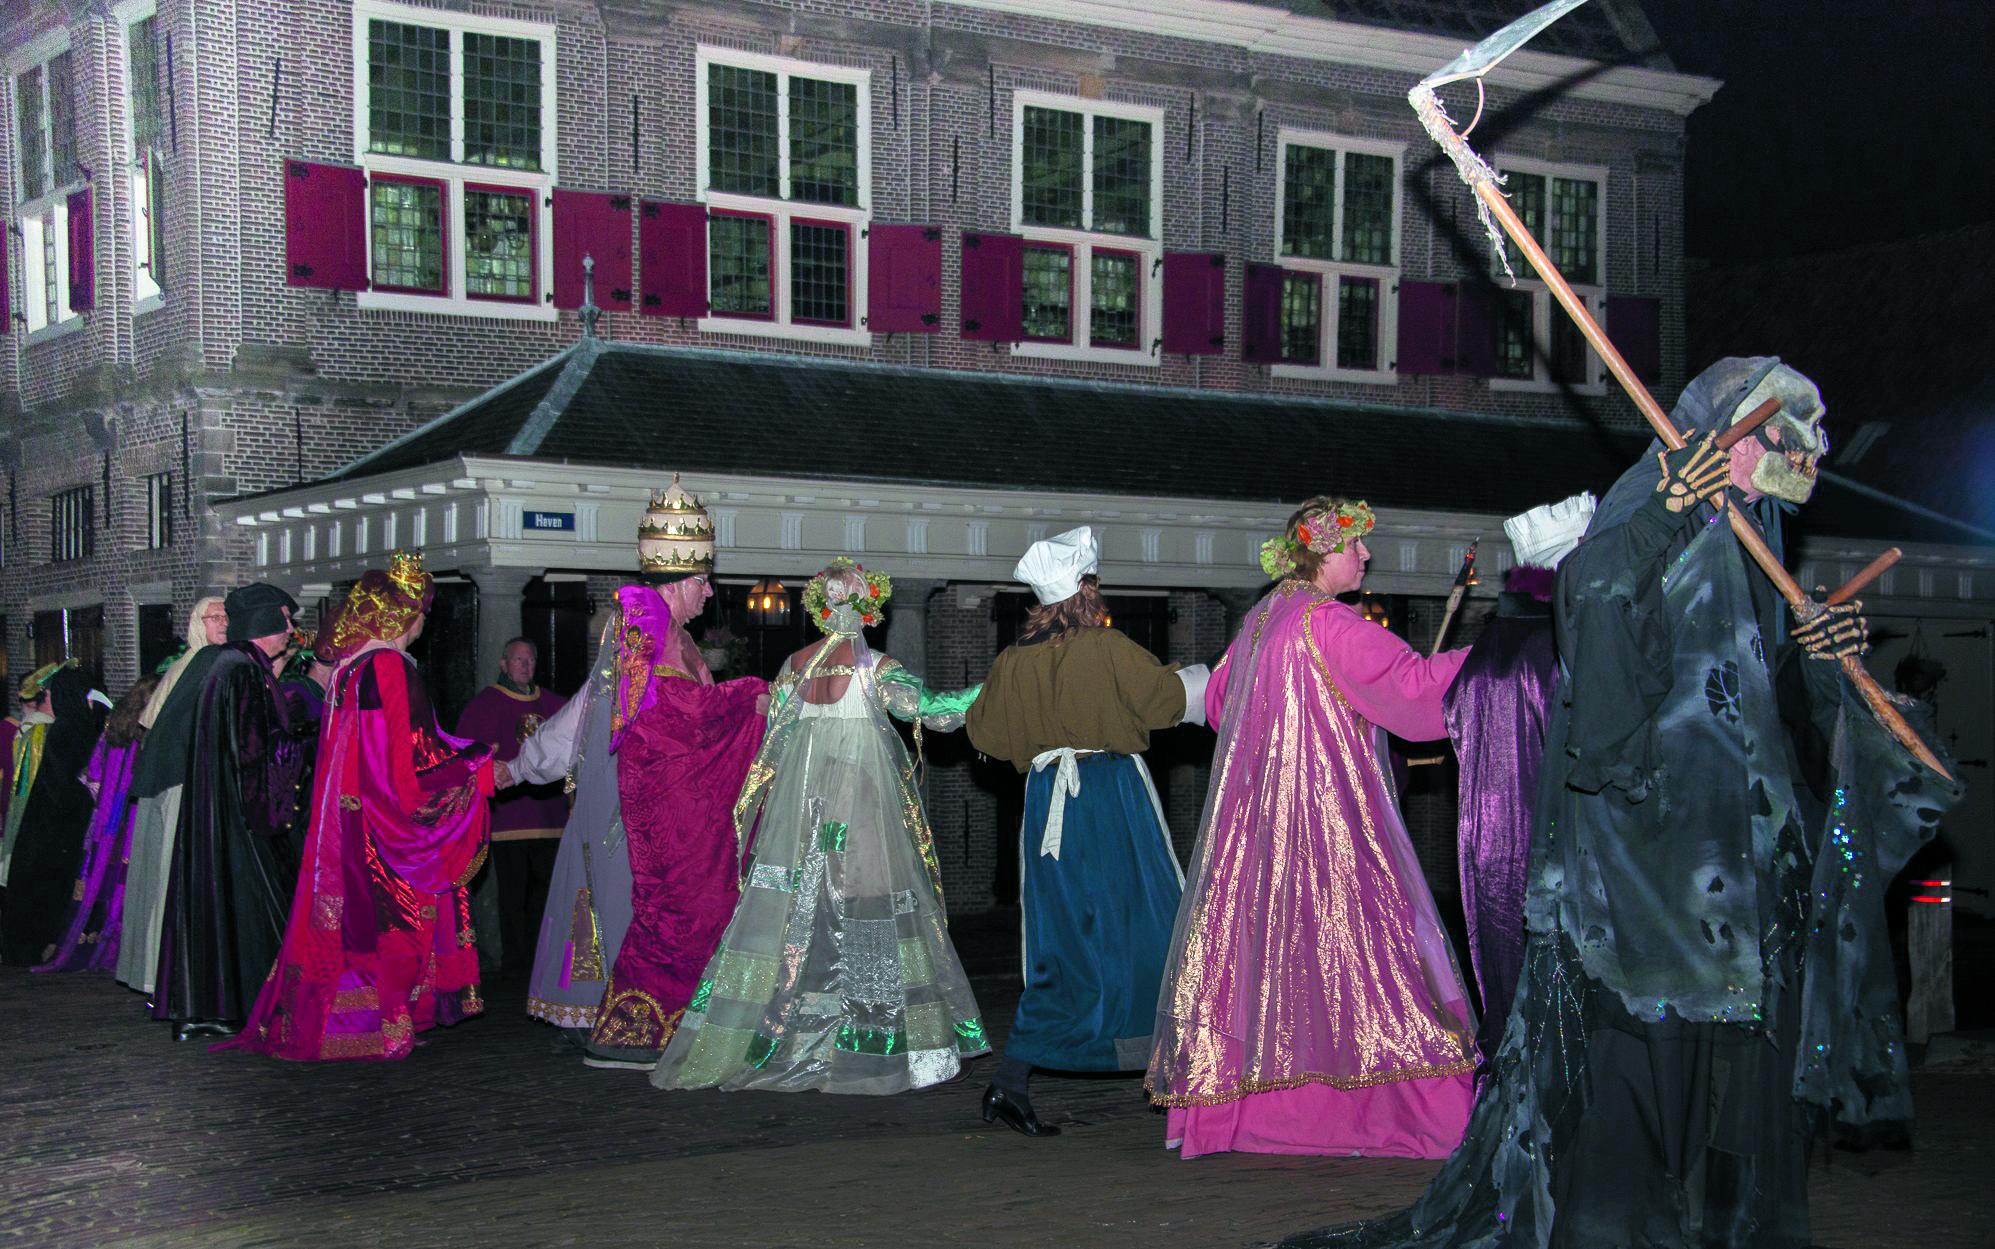 Magere Hein en dodendansers in Monnickendam. (Foto: Phfoto.nl)